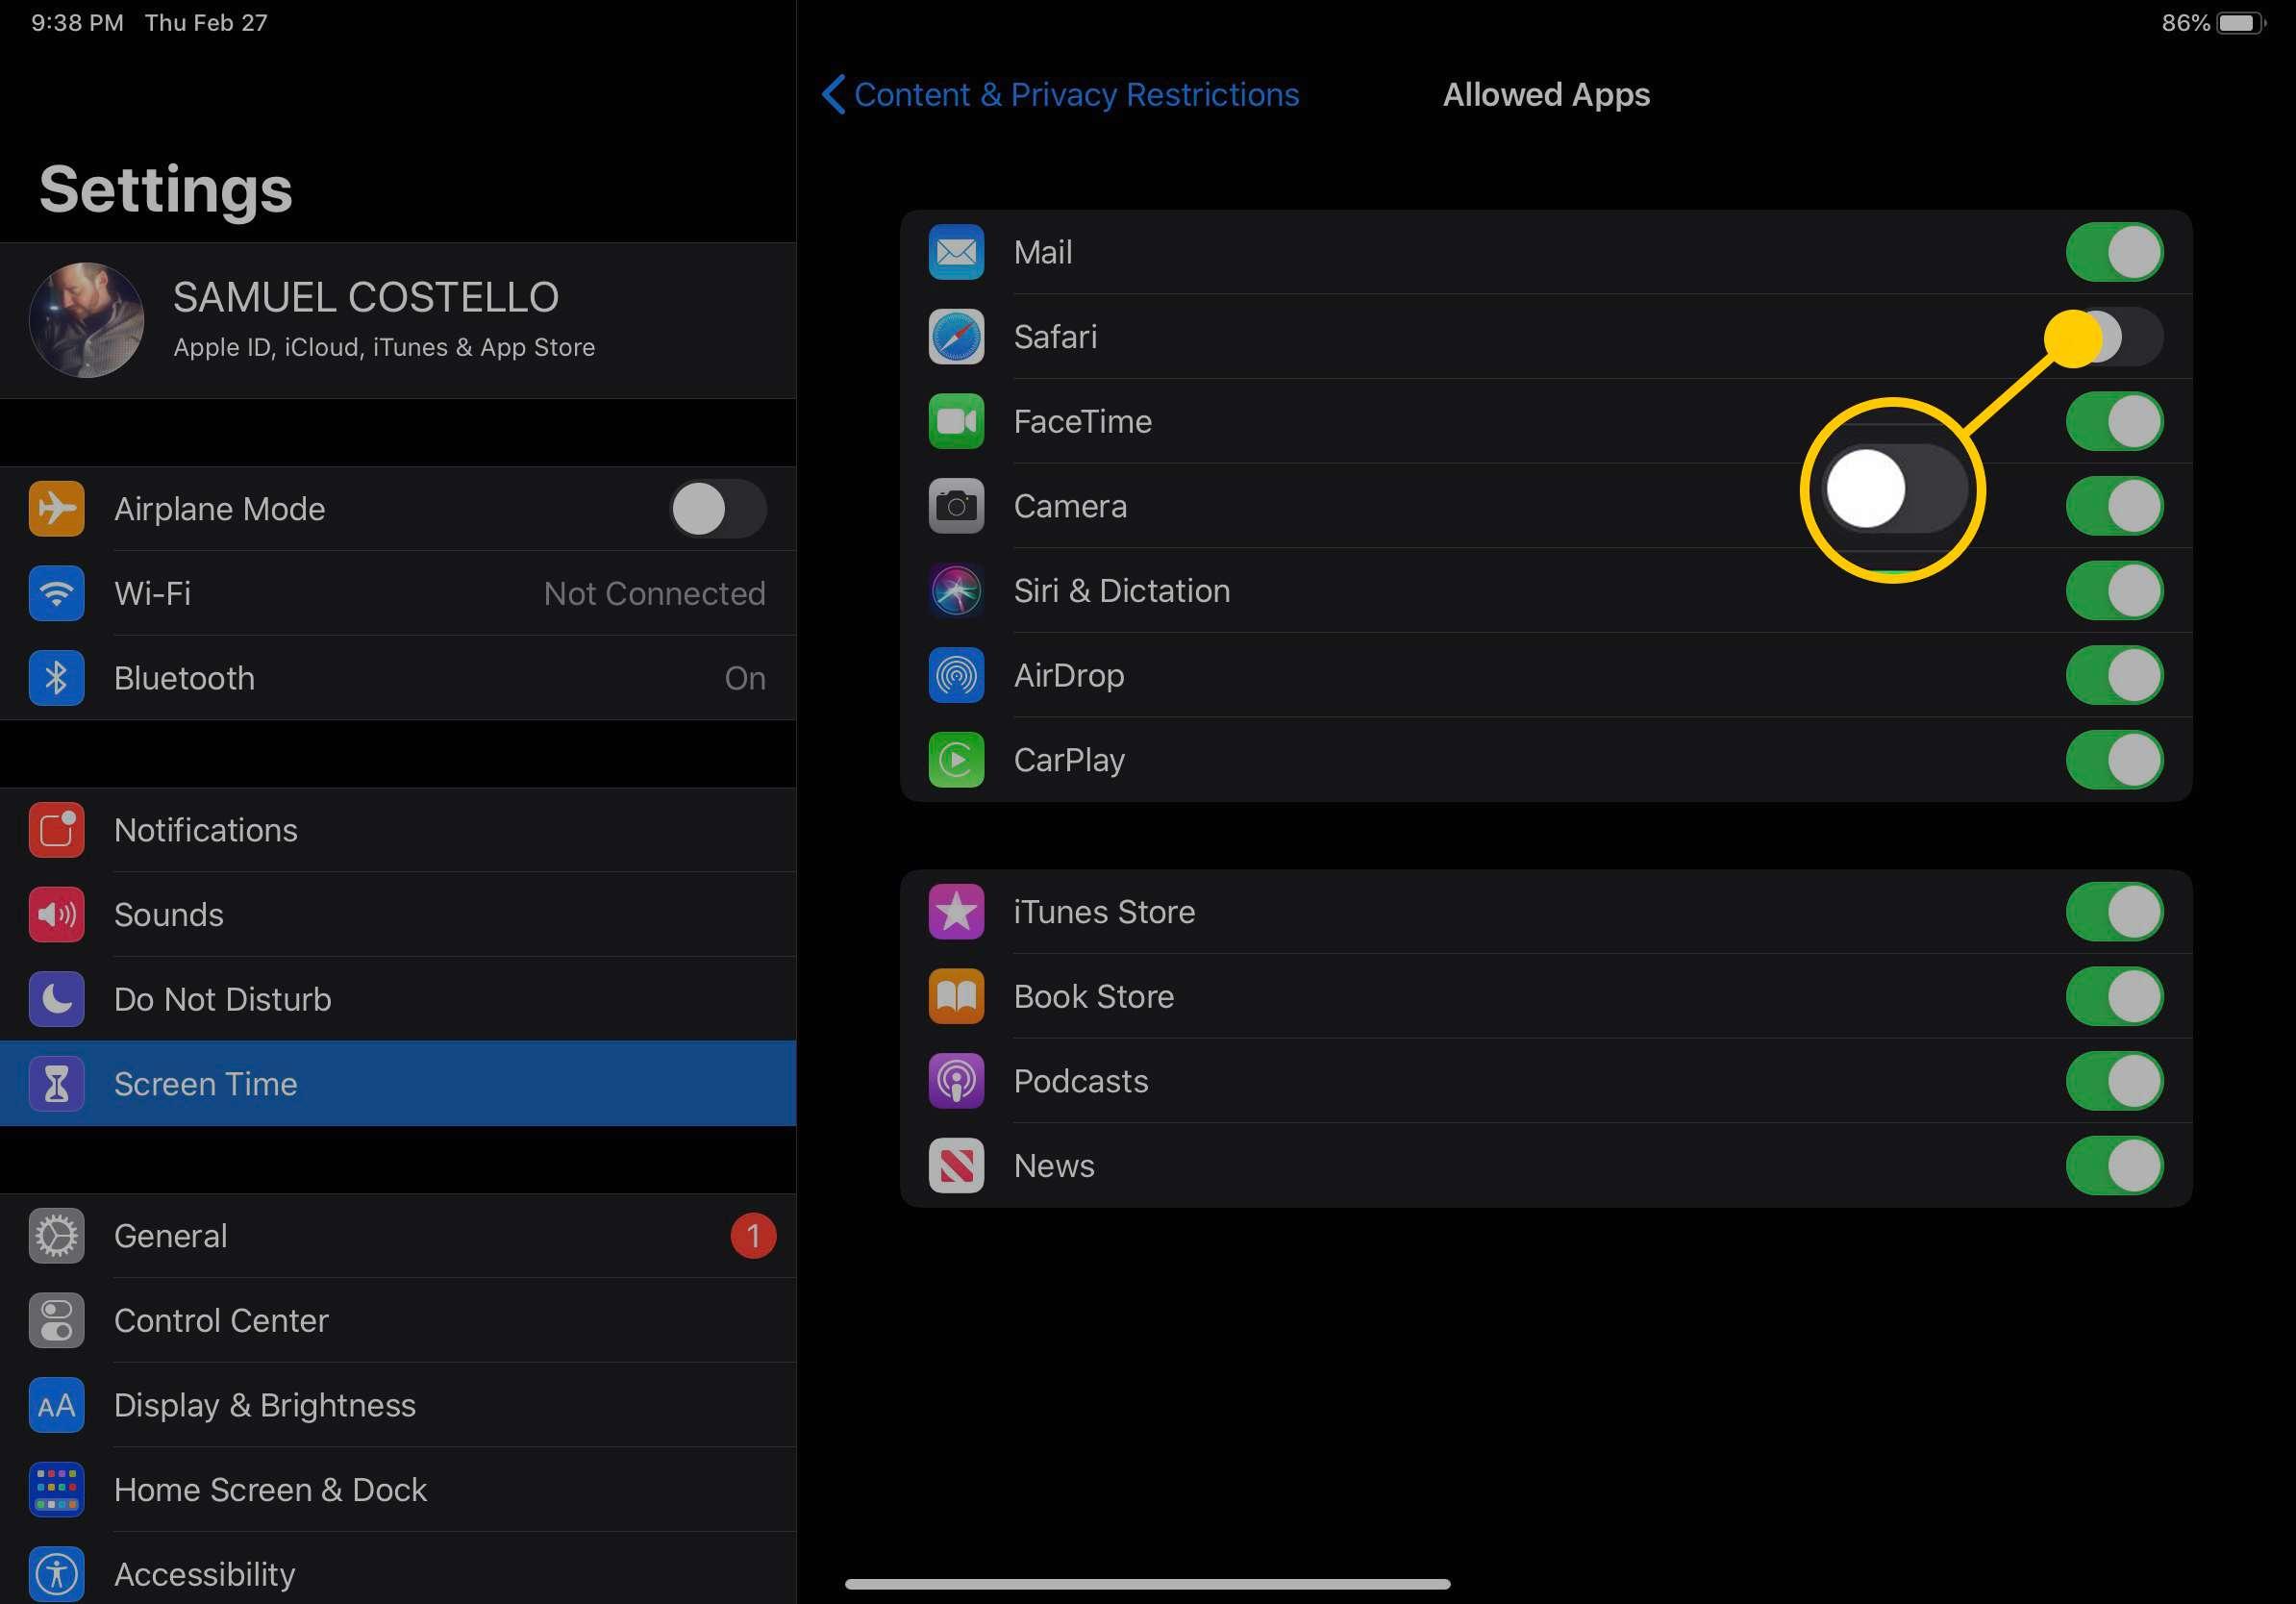 Screenshot of iPad Allowed Apps settings